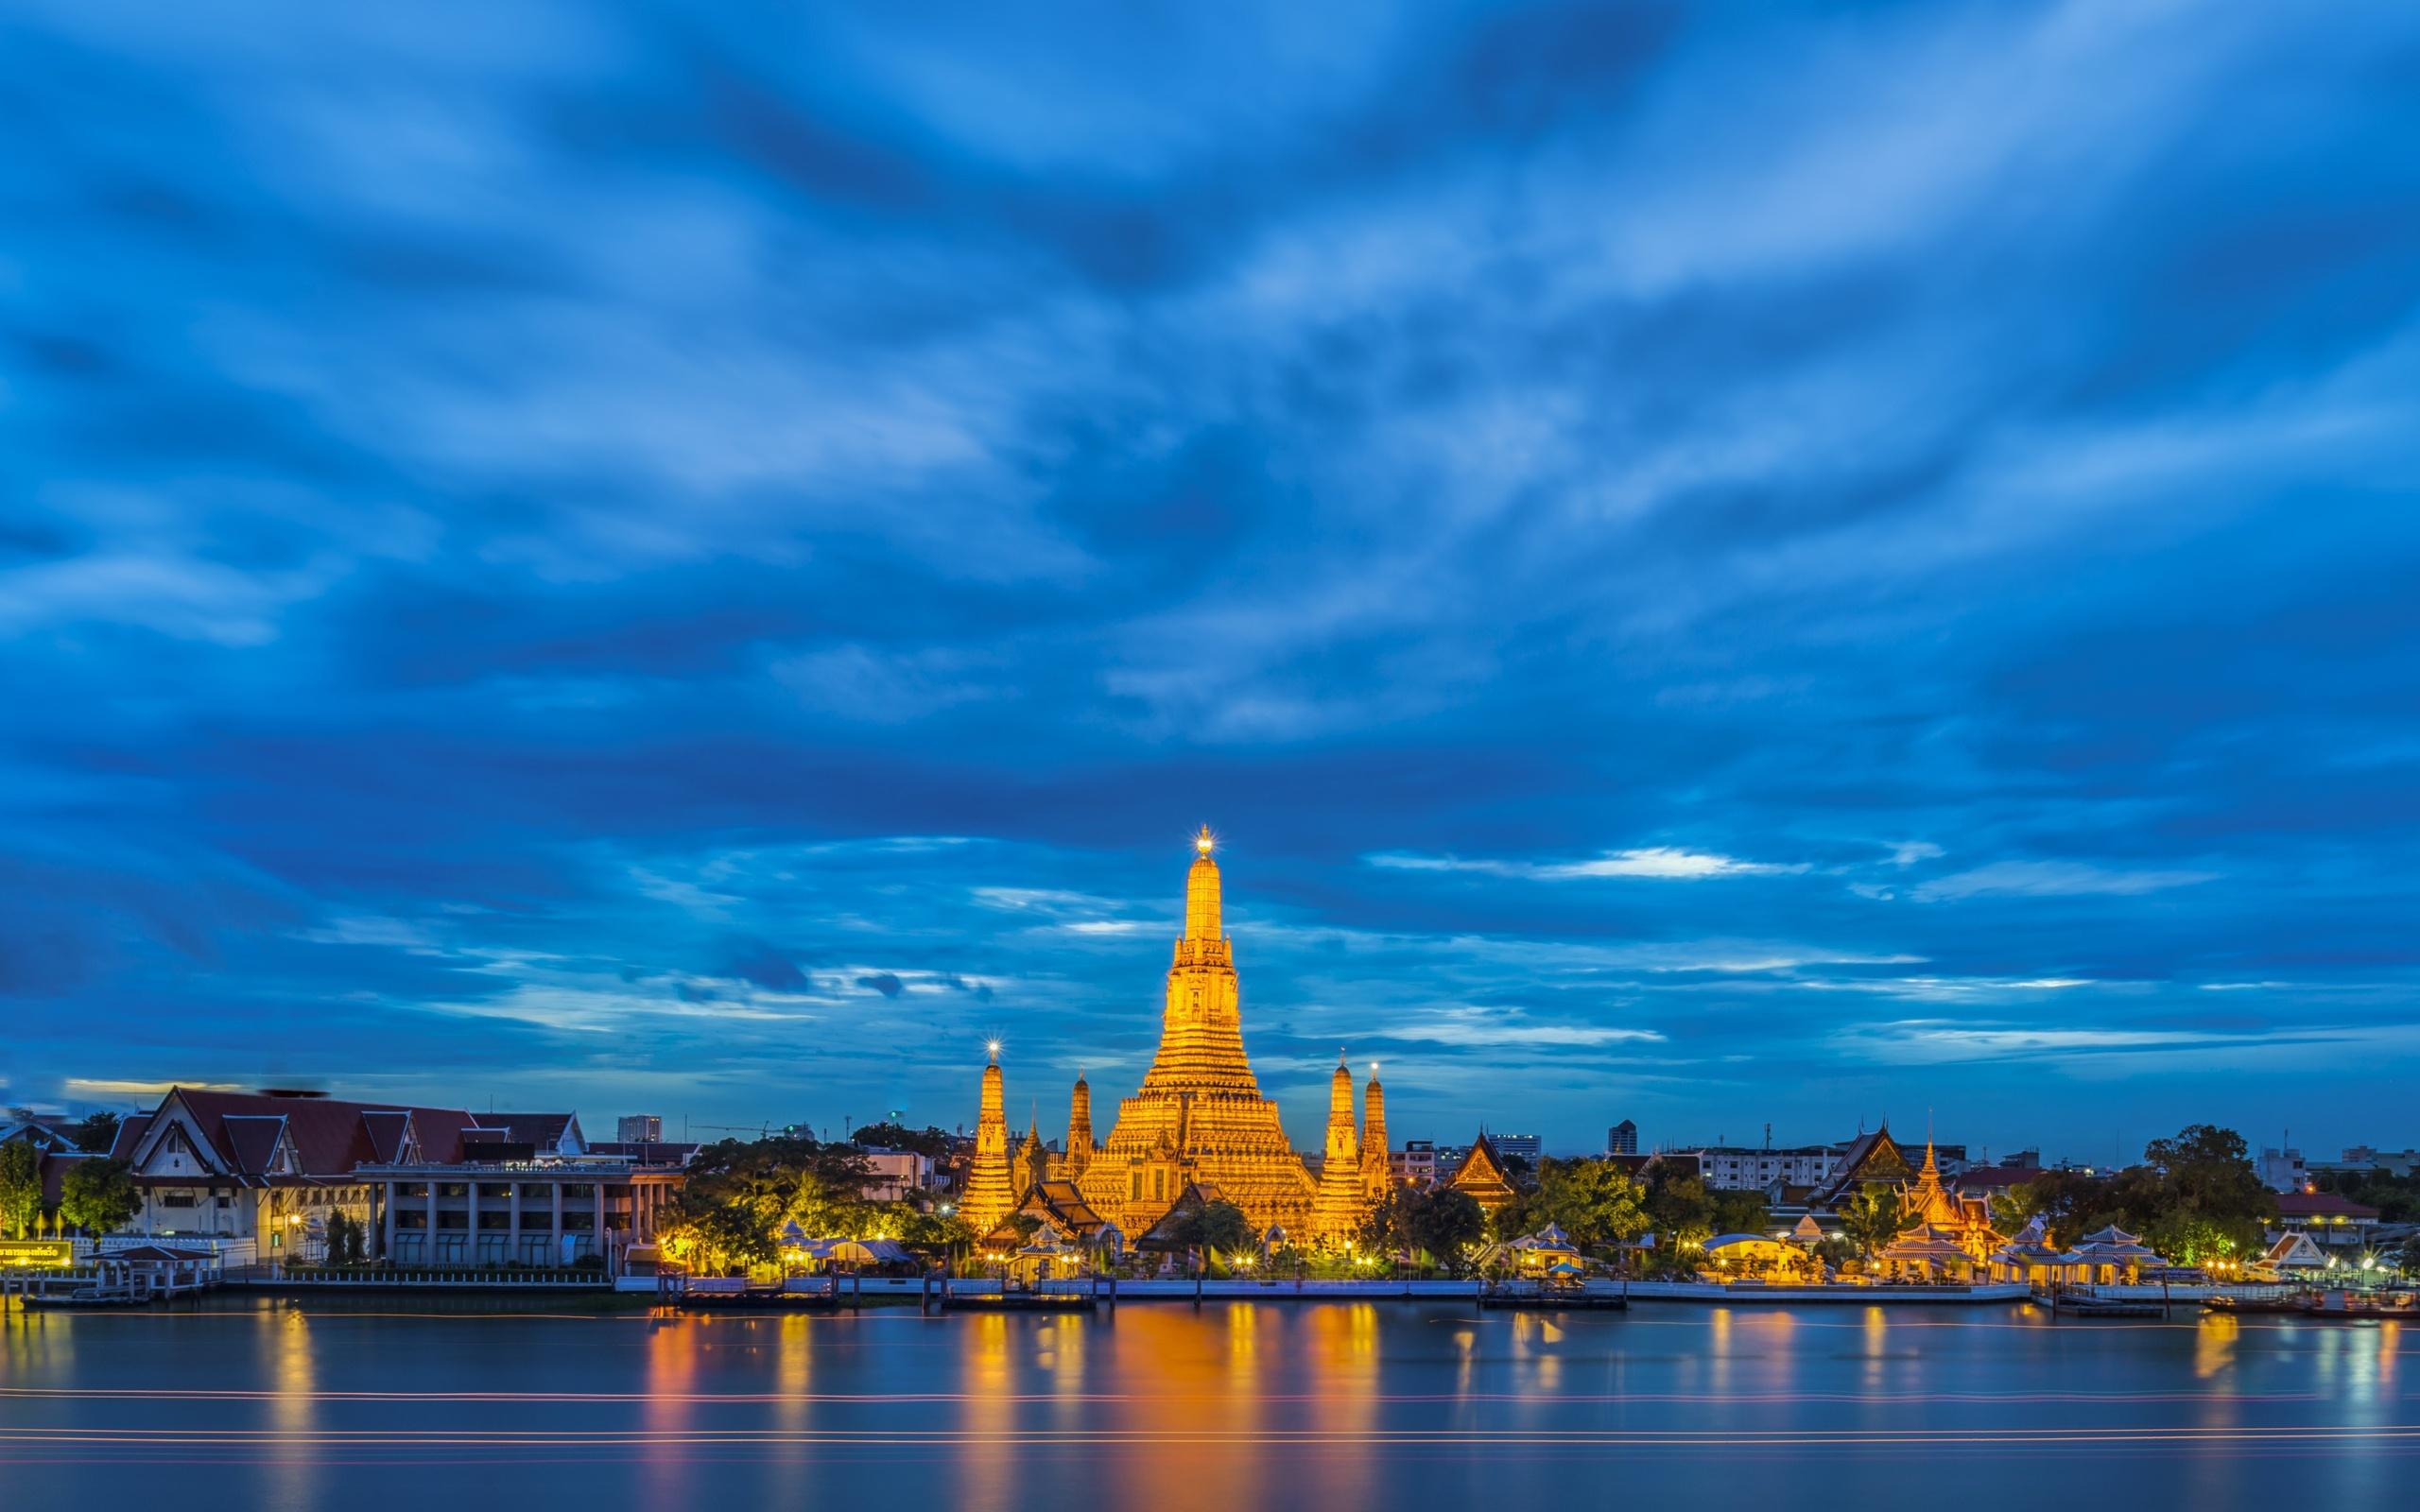 desktop wallpaper picture: Thailand Wallpaper Desktop